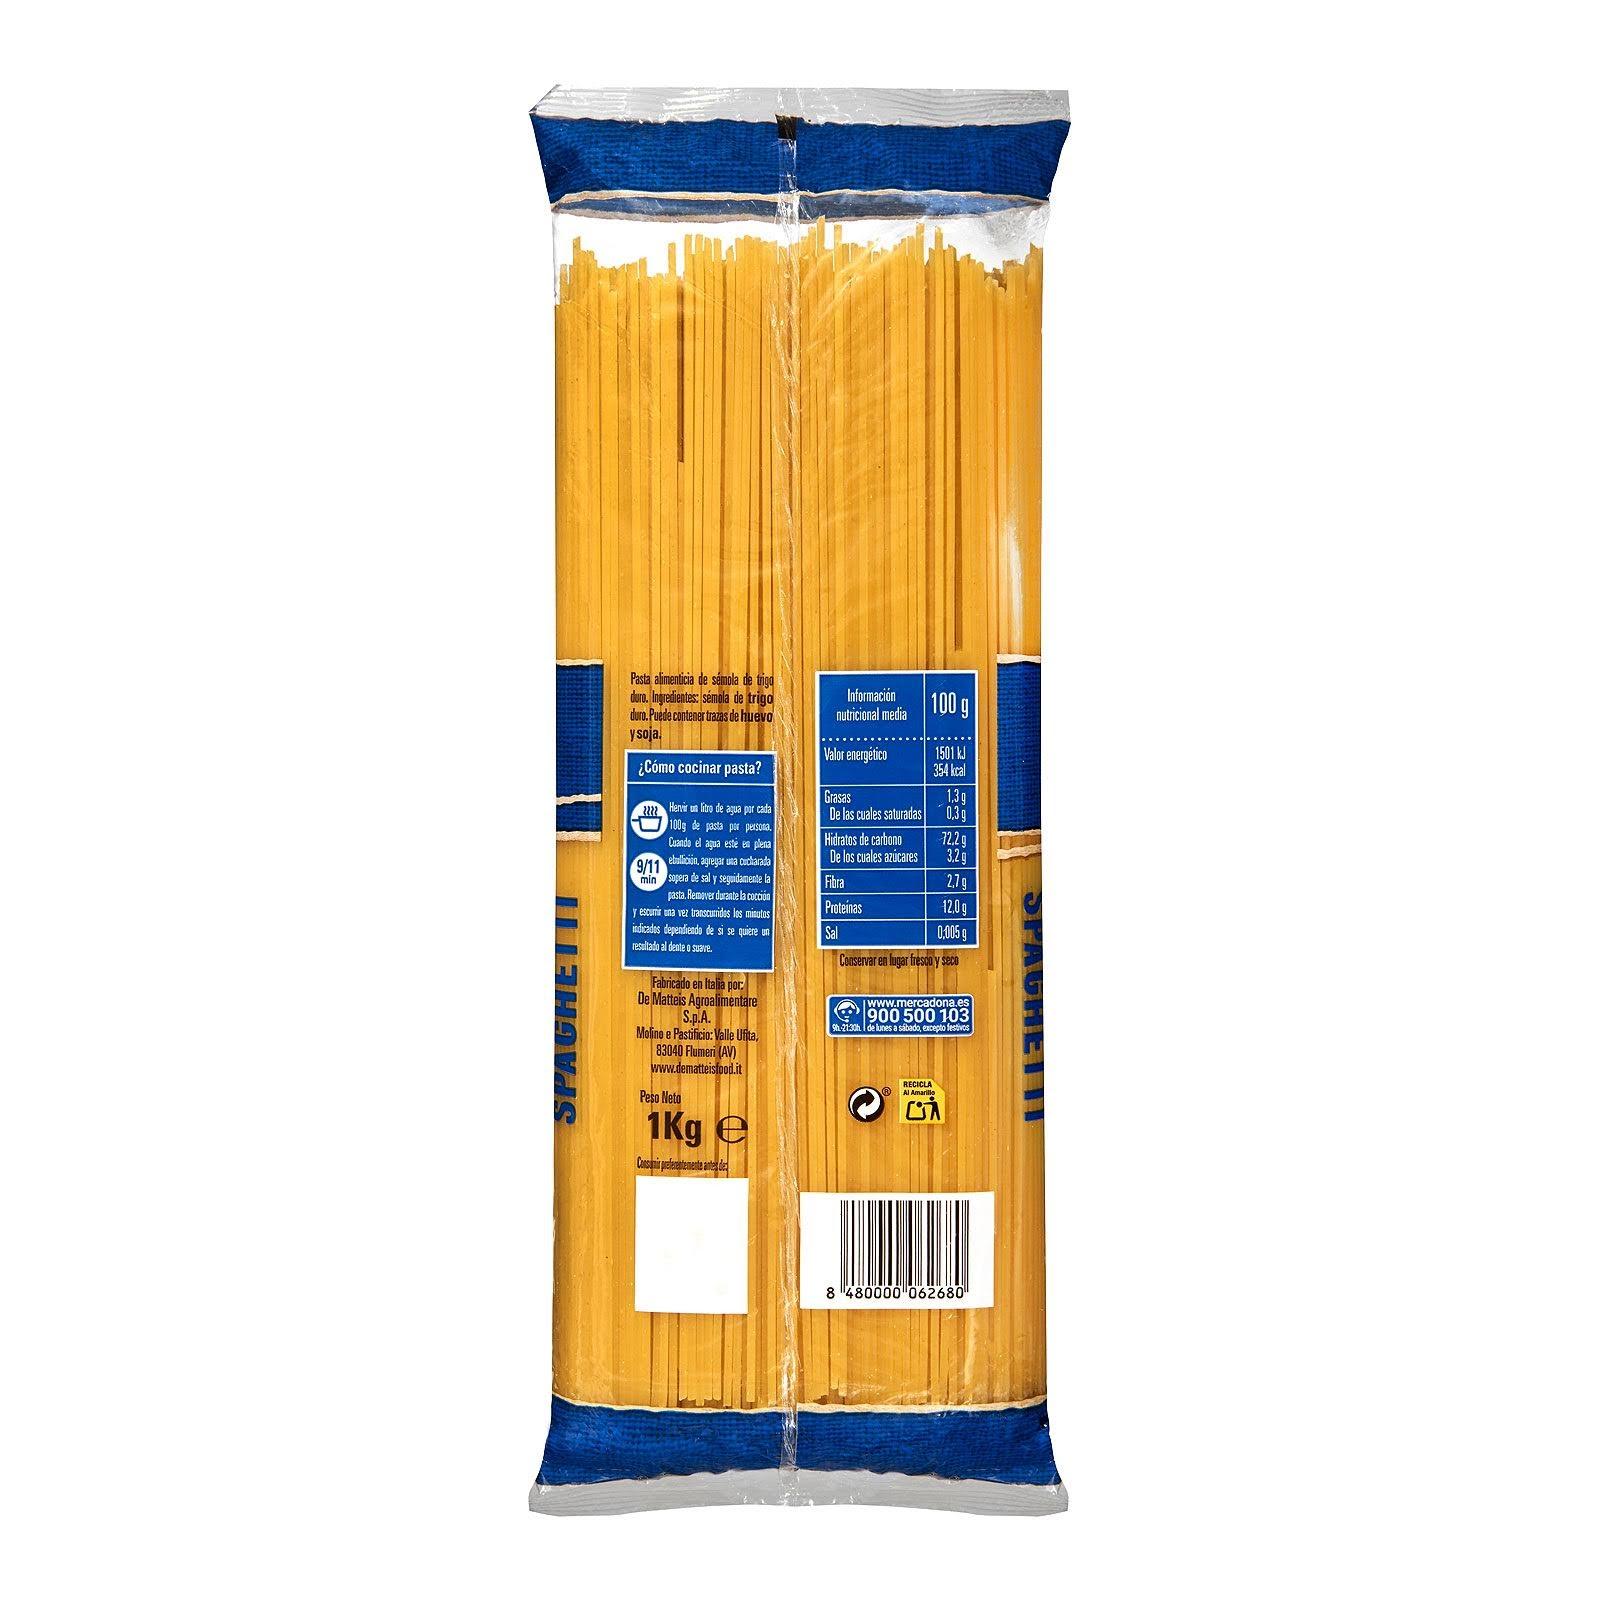 Spaghetti Hacendado